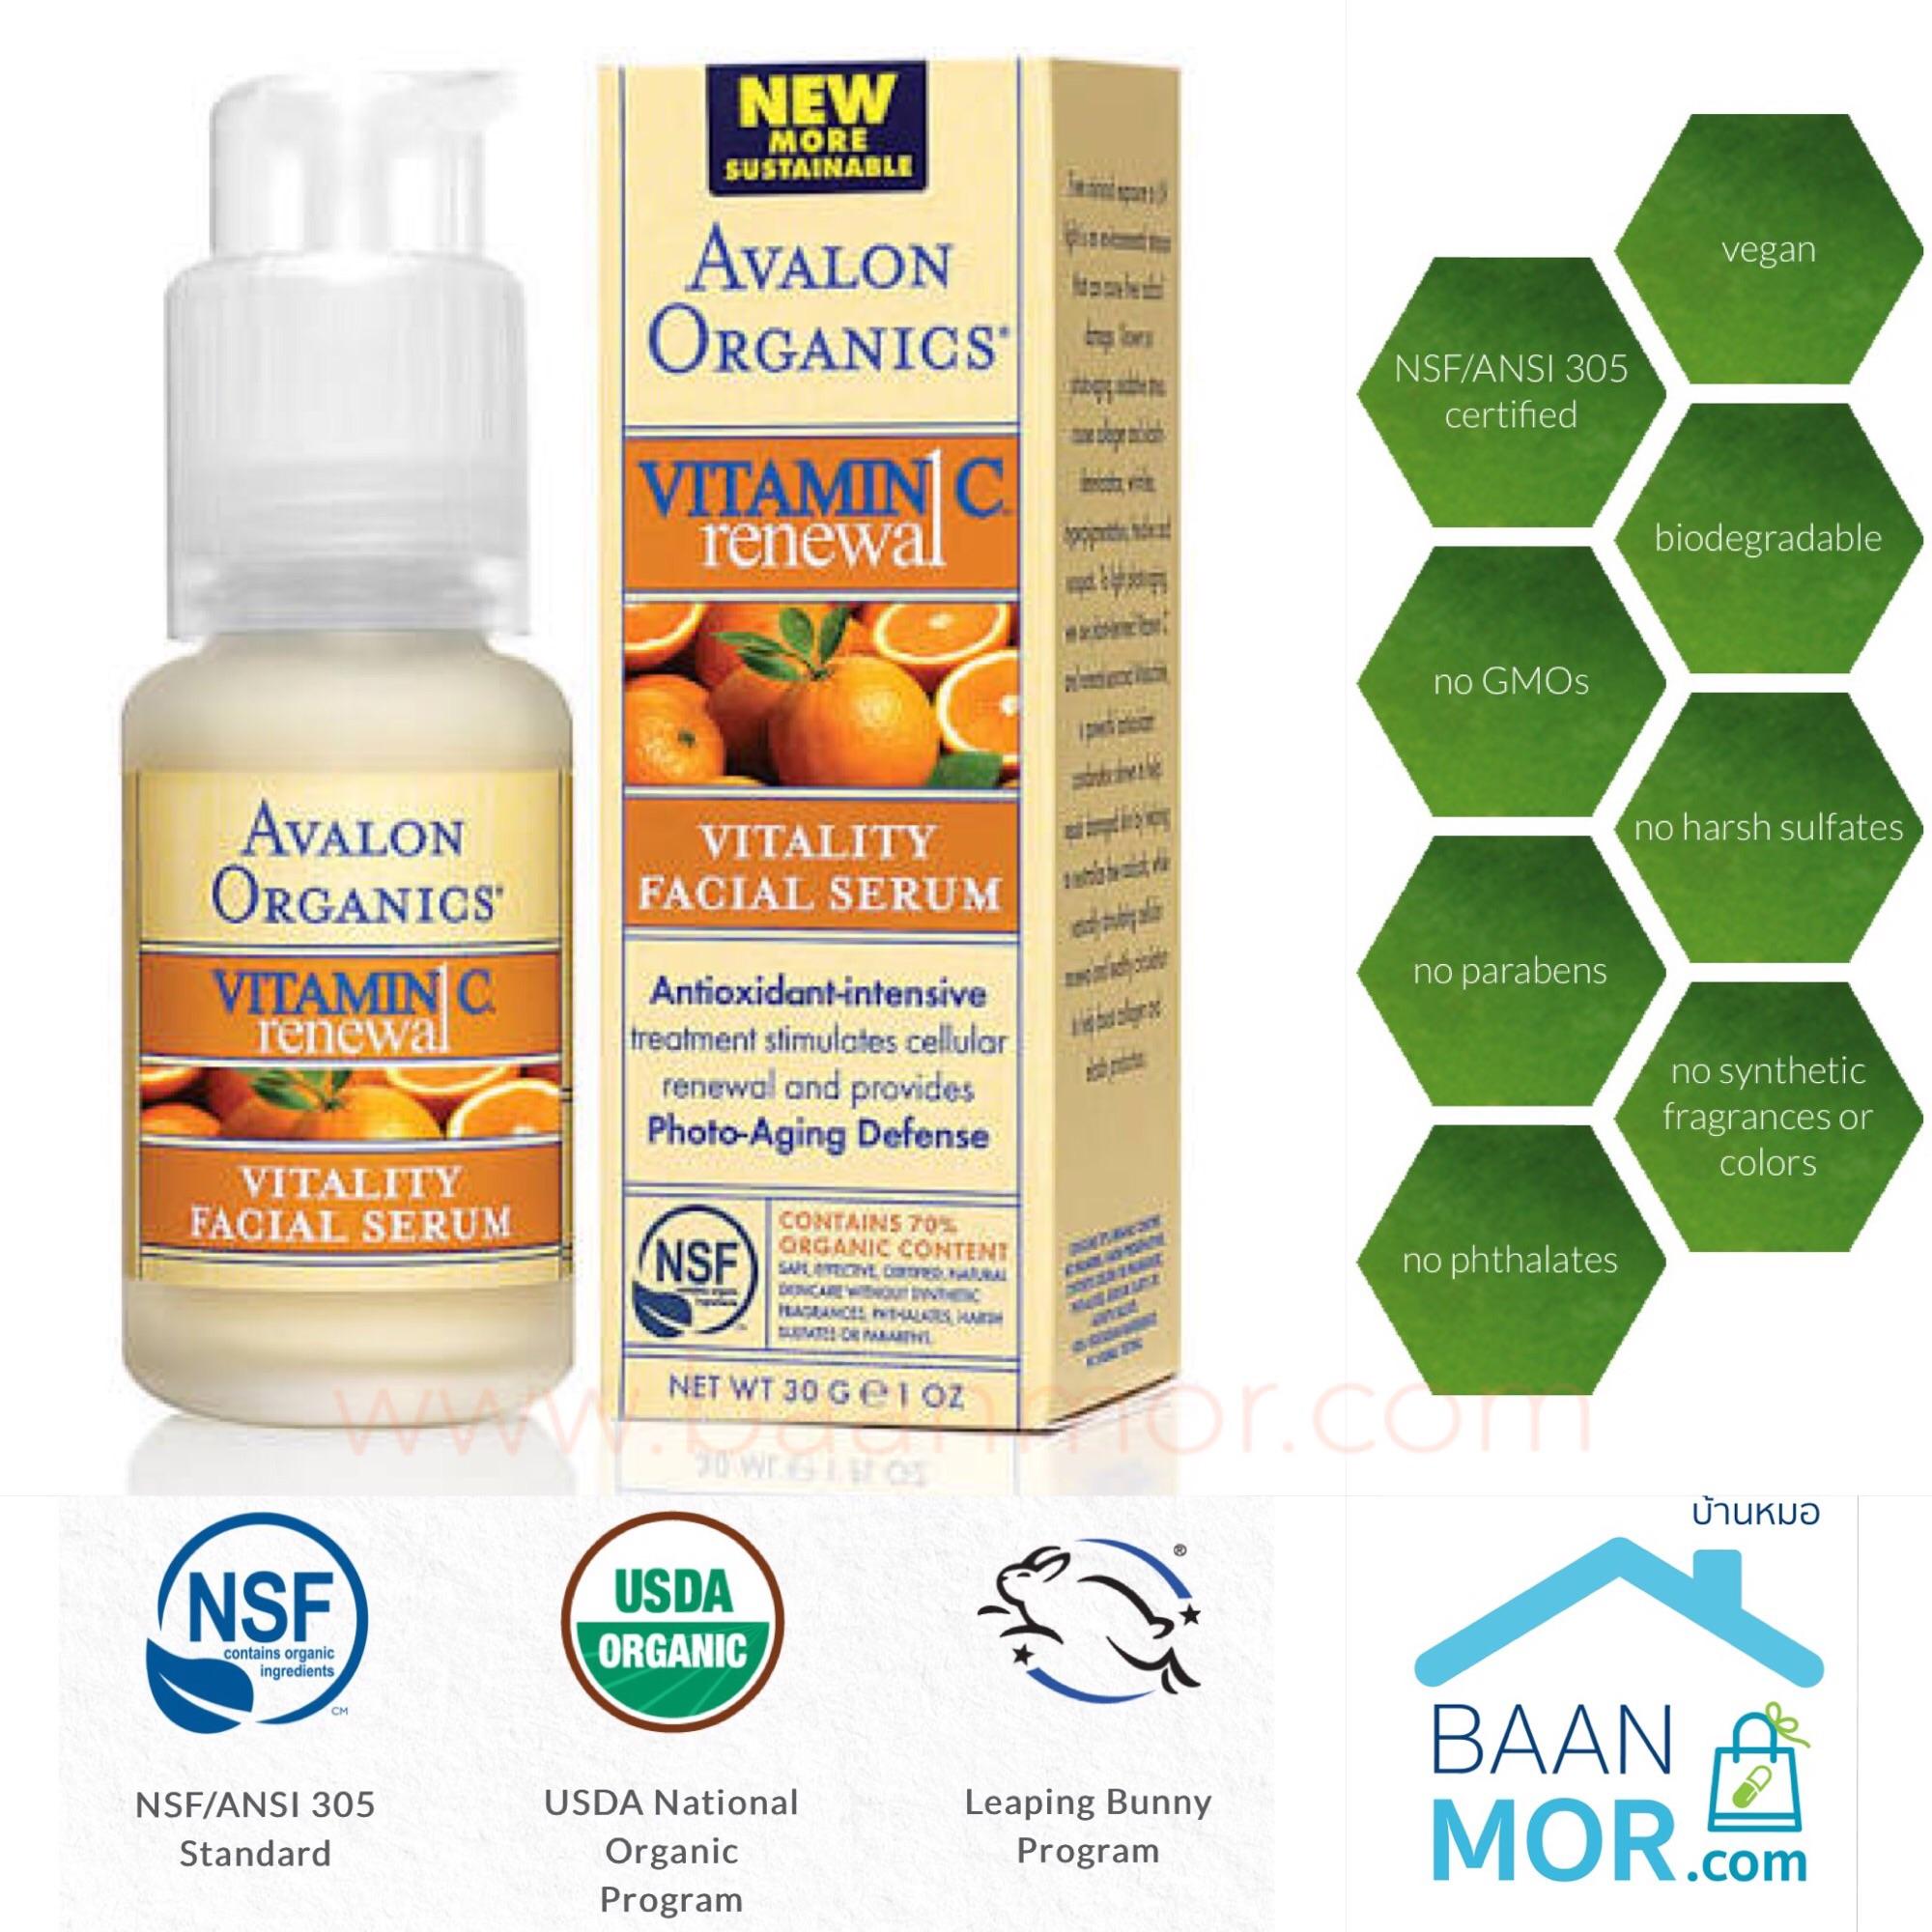 Vitamin C เข้มข้น &#x1F34A เพื่อผิวหน้าผ่องใส บริ้งค์ไบรท์ เนียนนุ่ม ลดริ้วรอย และความหมองคล้ำมาแล้วจ้าา &#x1F60D ⭐️ Avalon Organics Intense Defense with Vitamin C Facial Serum 1 ขวด 30 มล. คุณภาพดี ออร์แกนิคอ่อนโยน แต่เห็นผลจริง! สุดฮิตจากอเมริกาค่าาา ⭐️